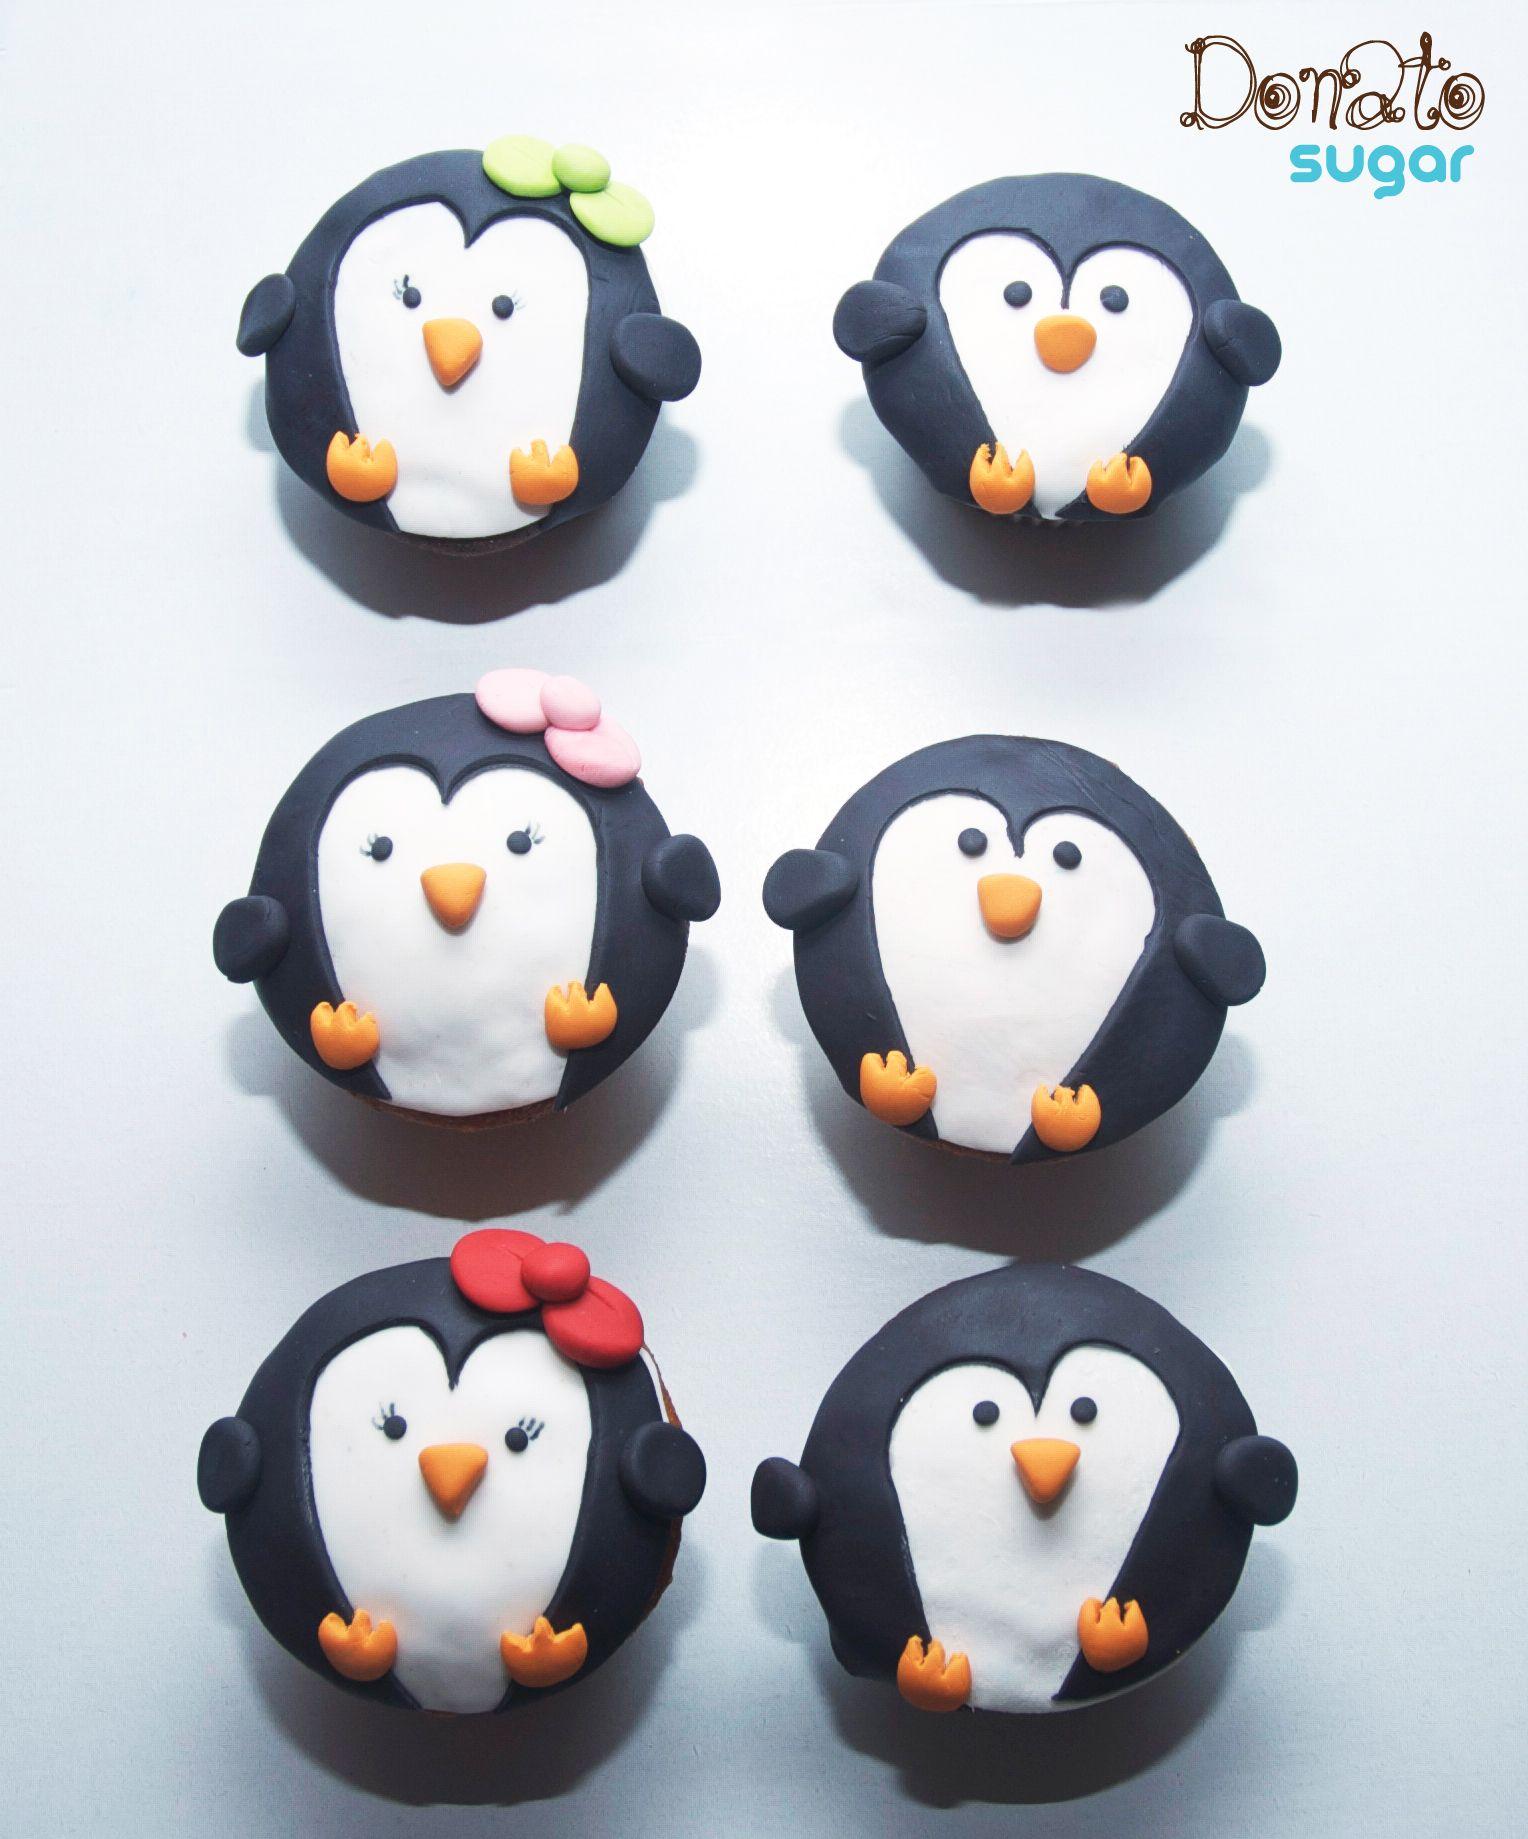 pinguinos | pingüinos | Pinterest | Rebecas, Mi niña y Bichos